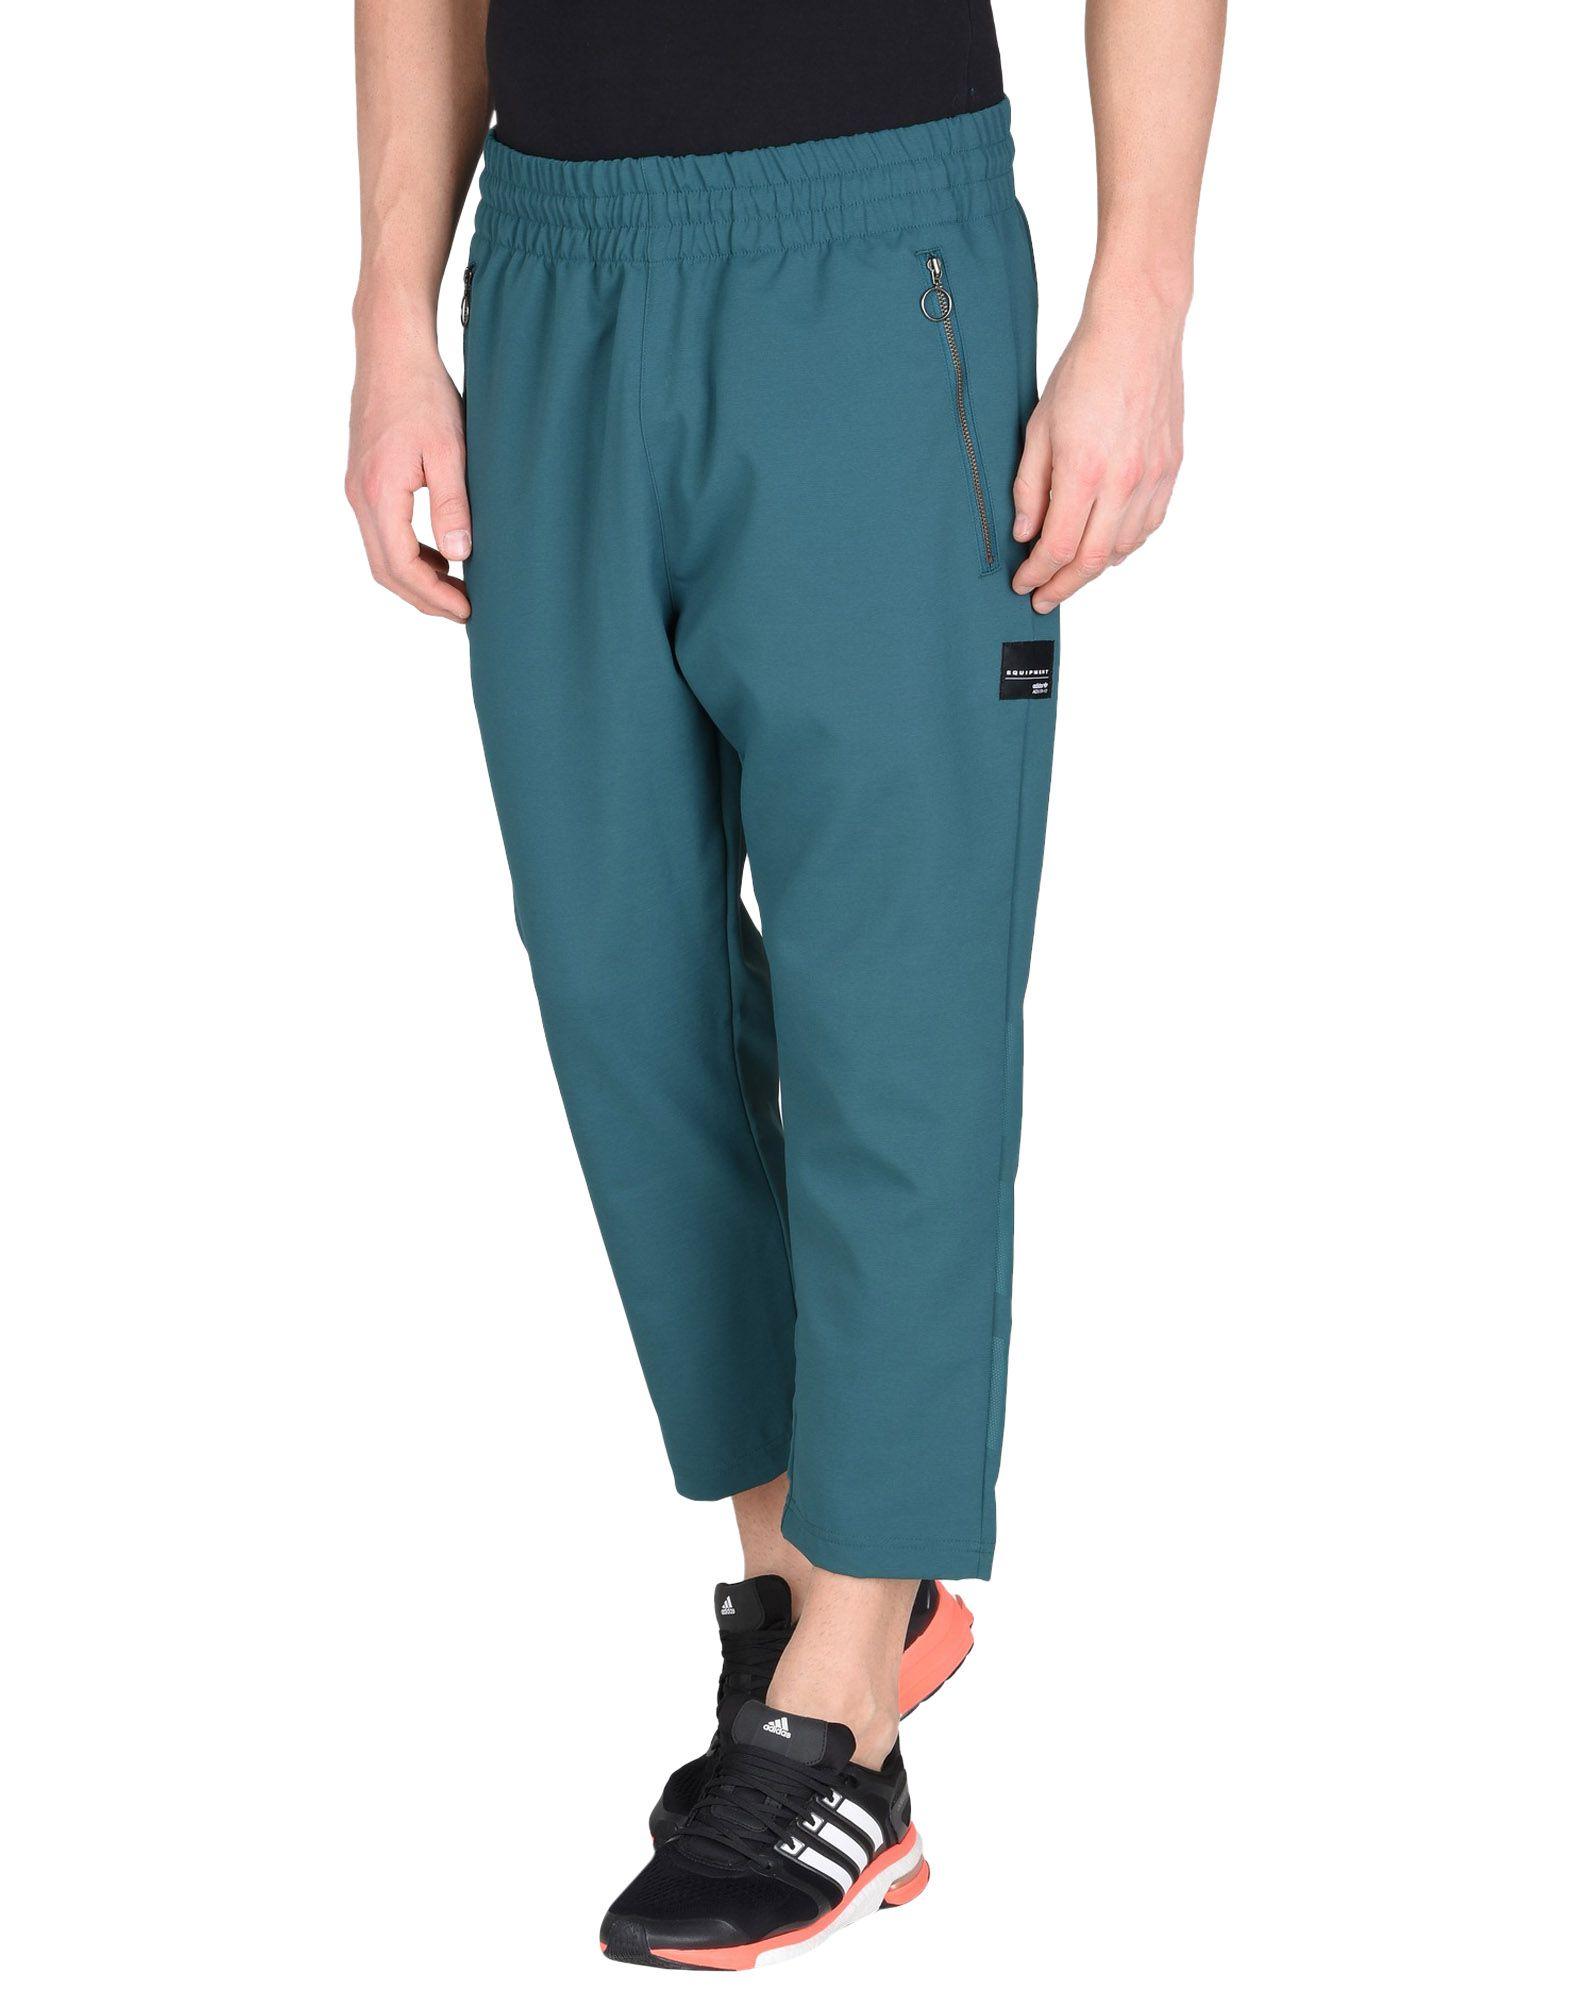 Pantalone Sportivo Adidas Originals Eqt Adv Tp - Uomo - Acquista online su